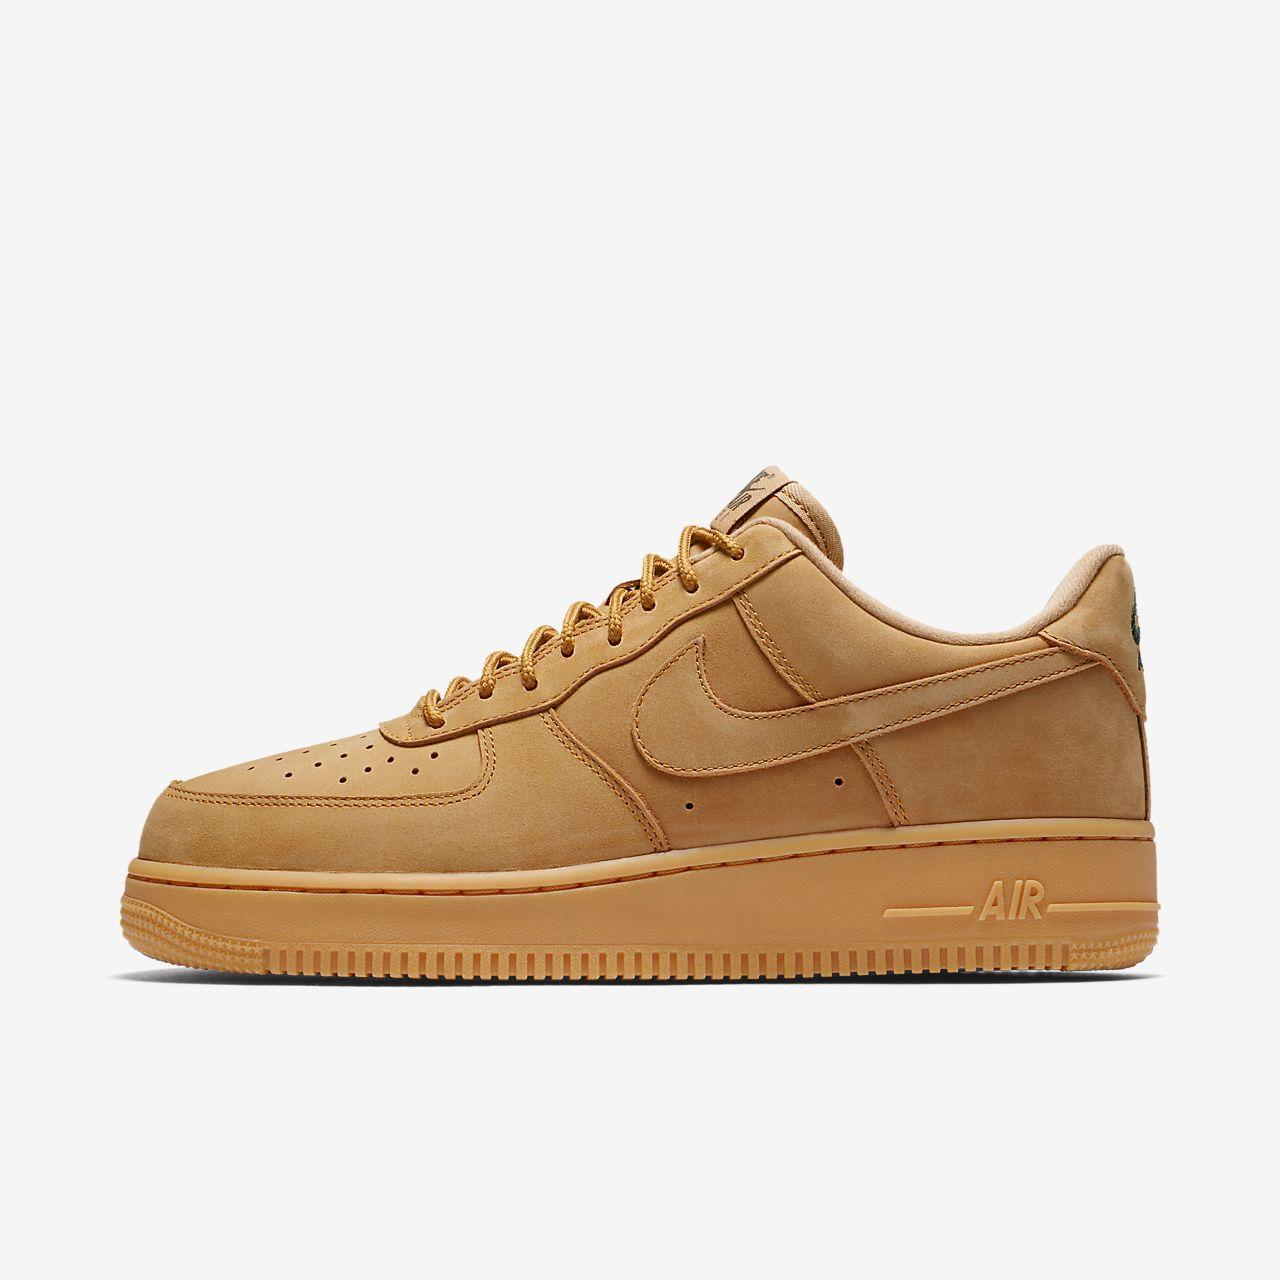 on sale 77f31 18bb3 ... Sko Nike Air Force 1 07 WB för män